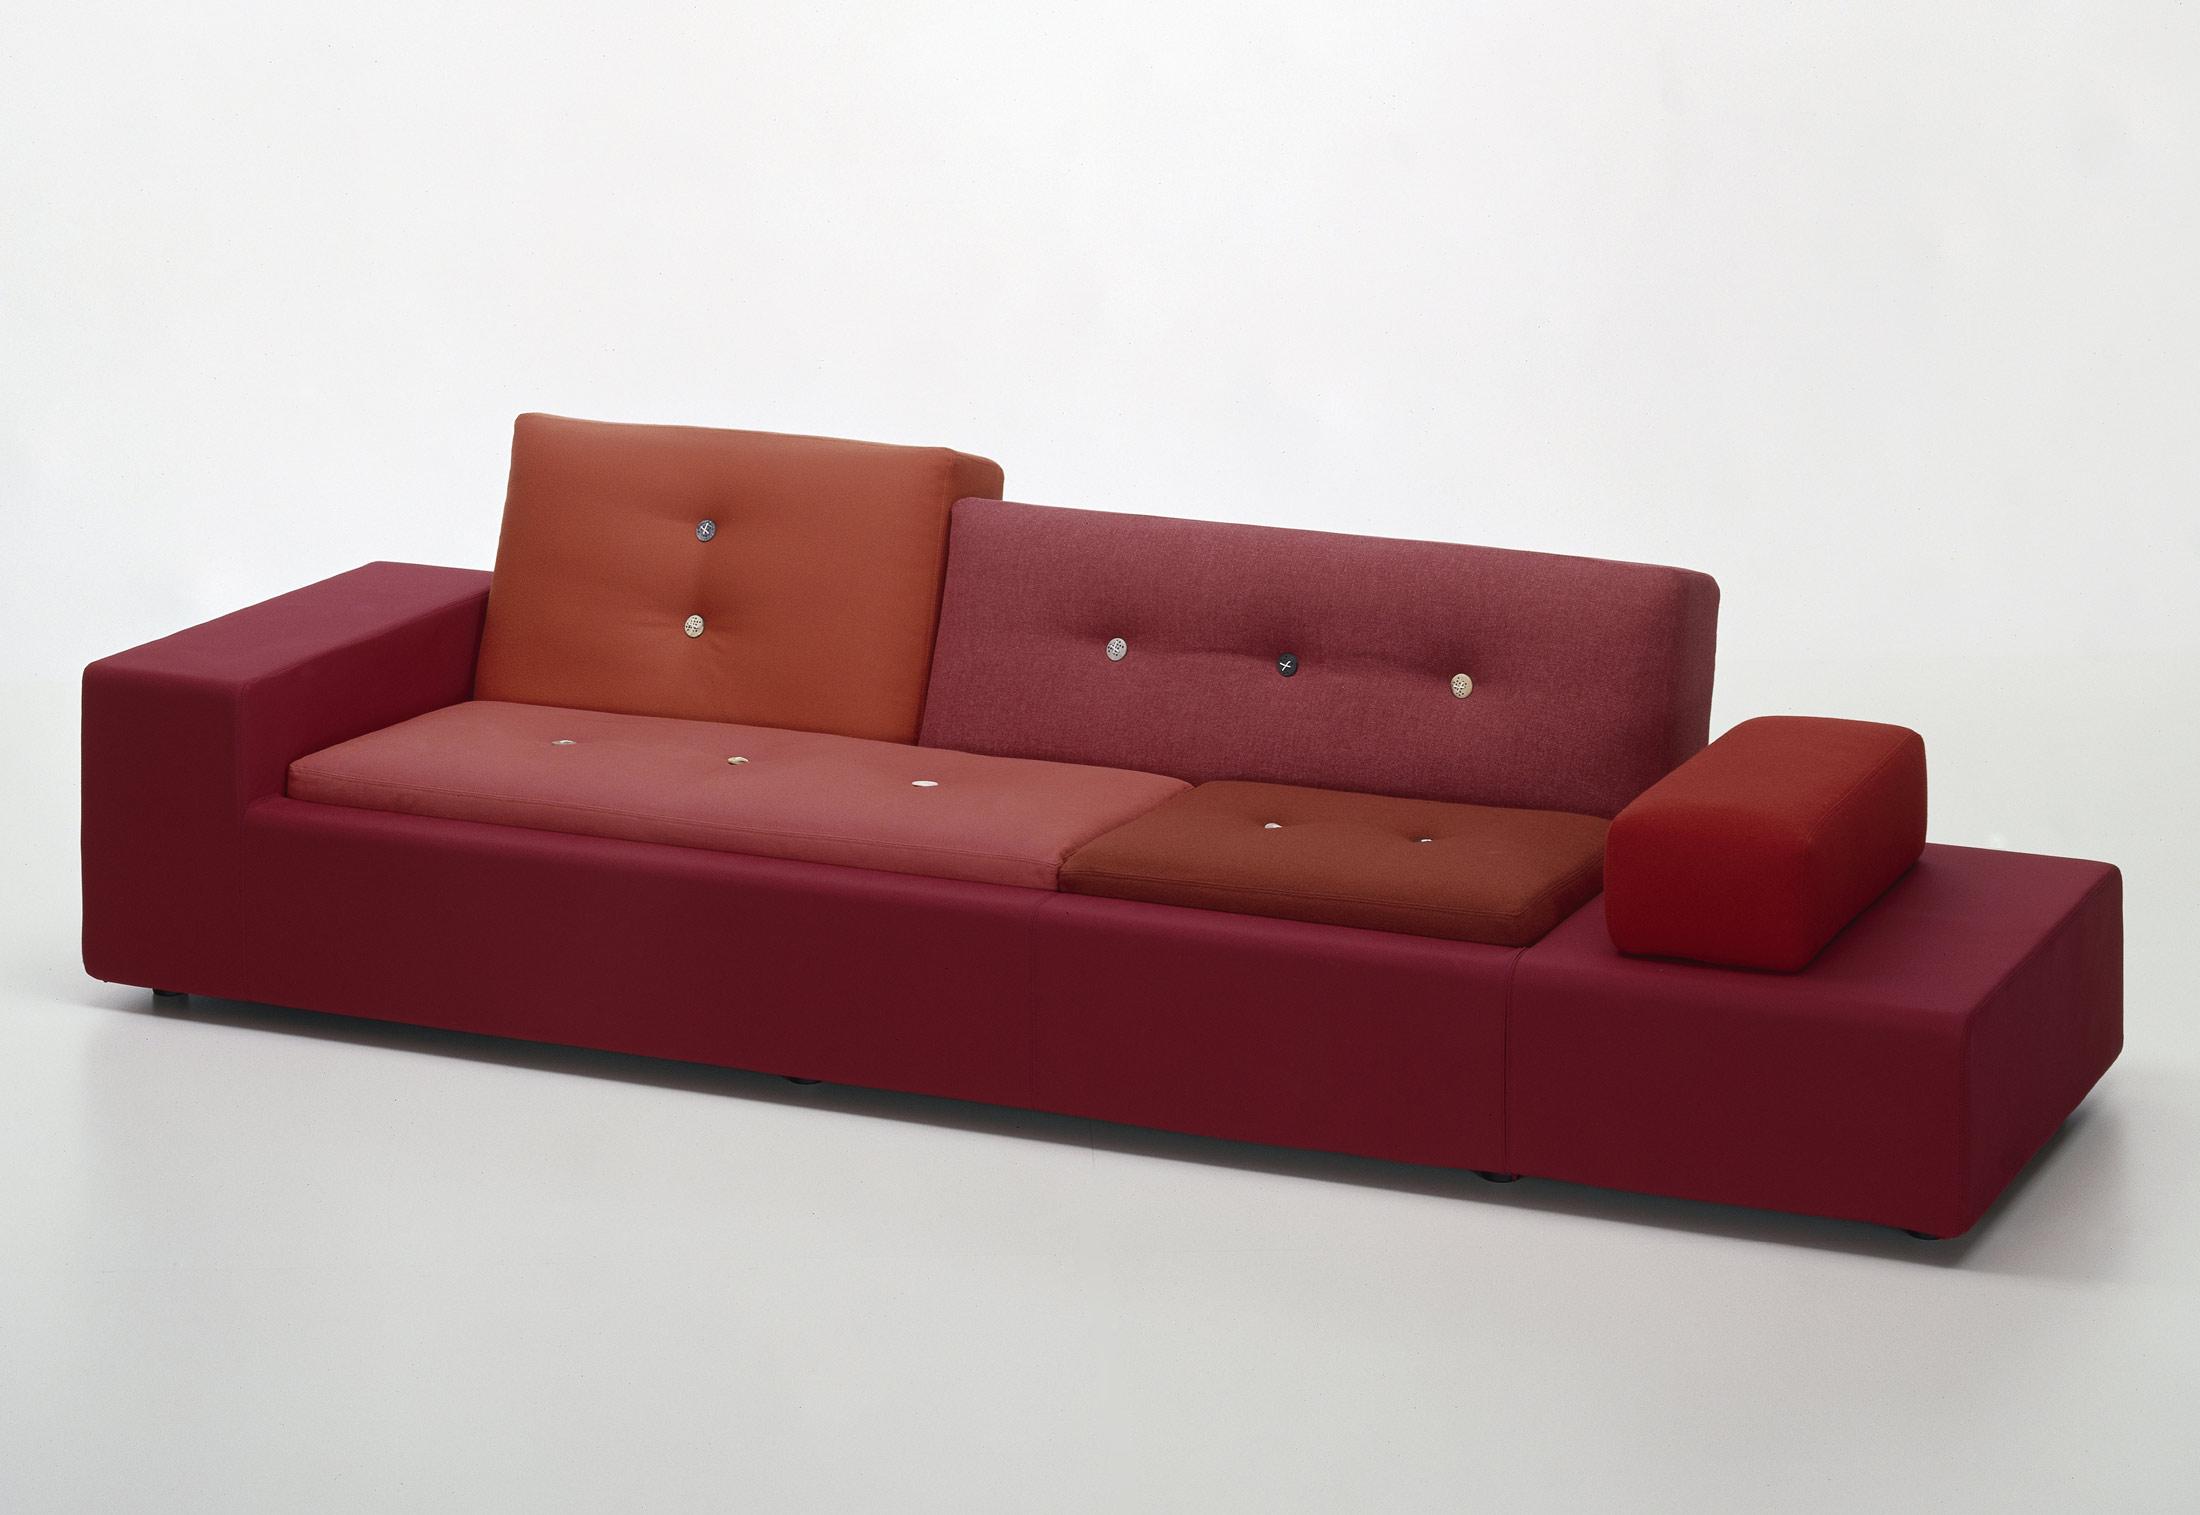 Full Size of Vitra Sofa Jasper Morrison Sofabord Soft Modular Bed Alcove Plate Suita 3 Seater Mit Holzfüßen Schlafsofa Liegefläche 180x200 Karup Recamiere Big Sofa Vitra Sofa